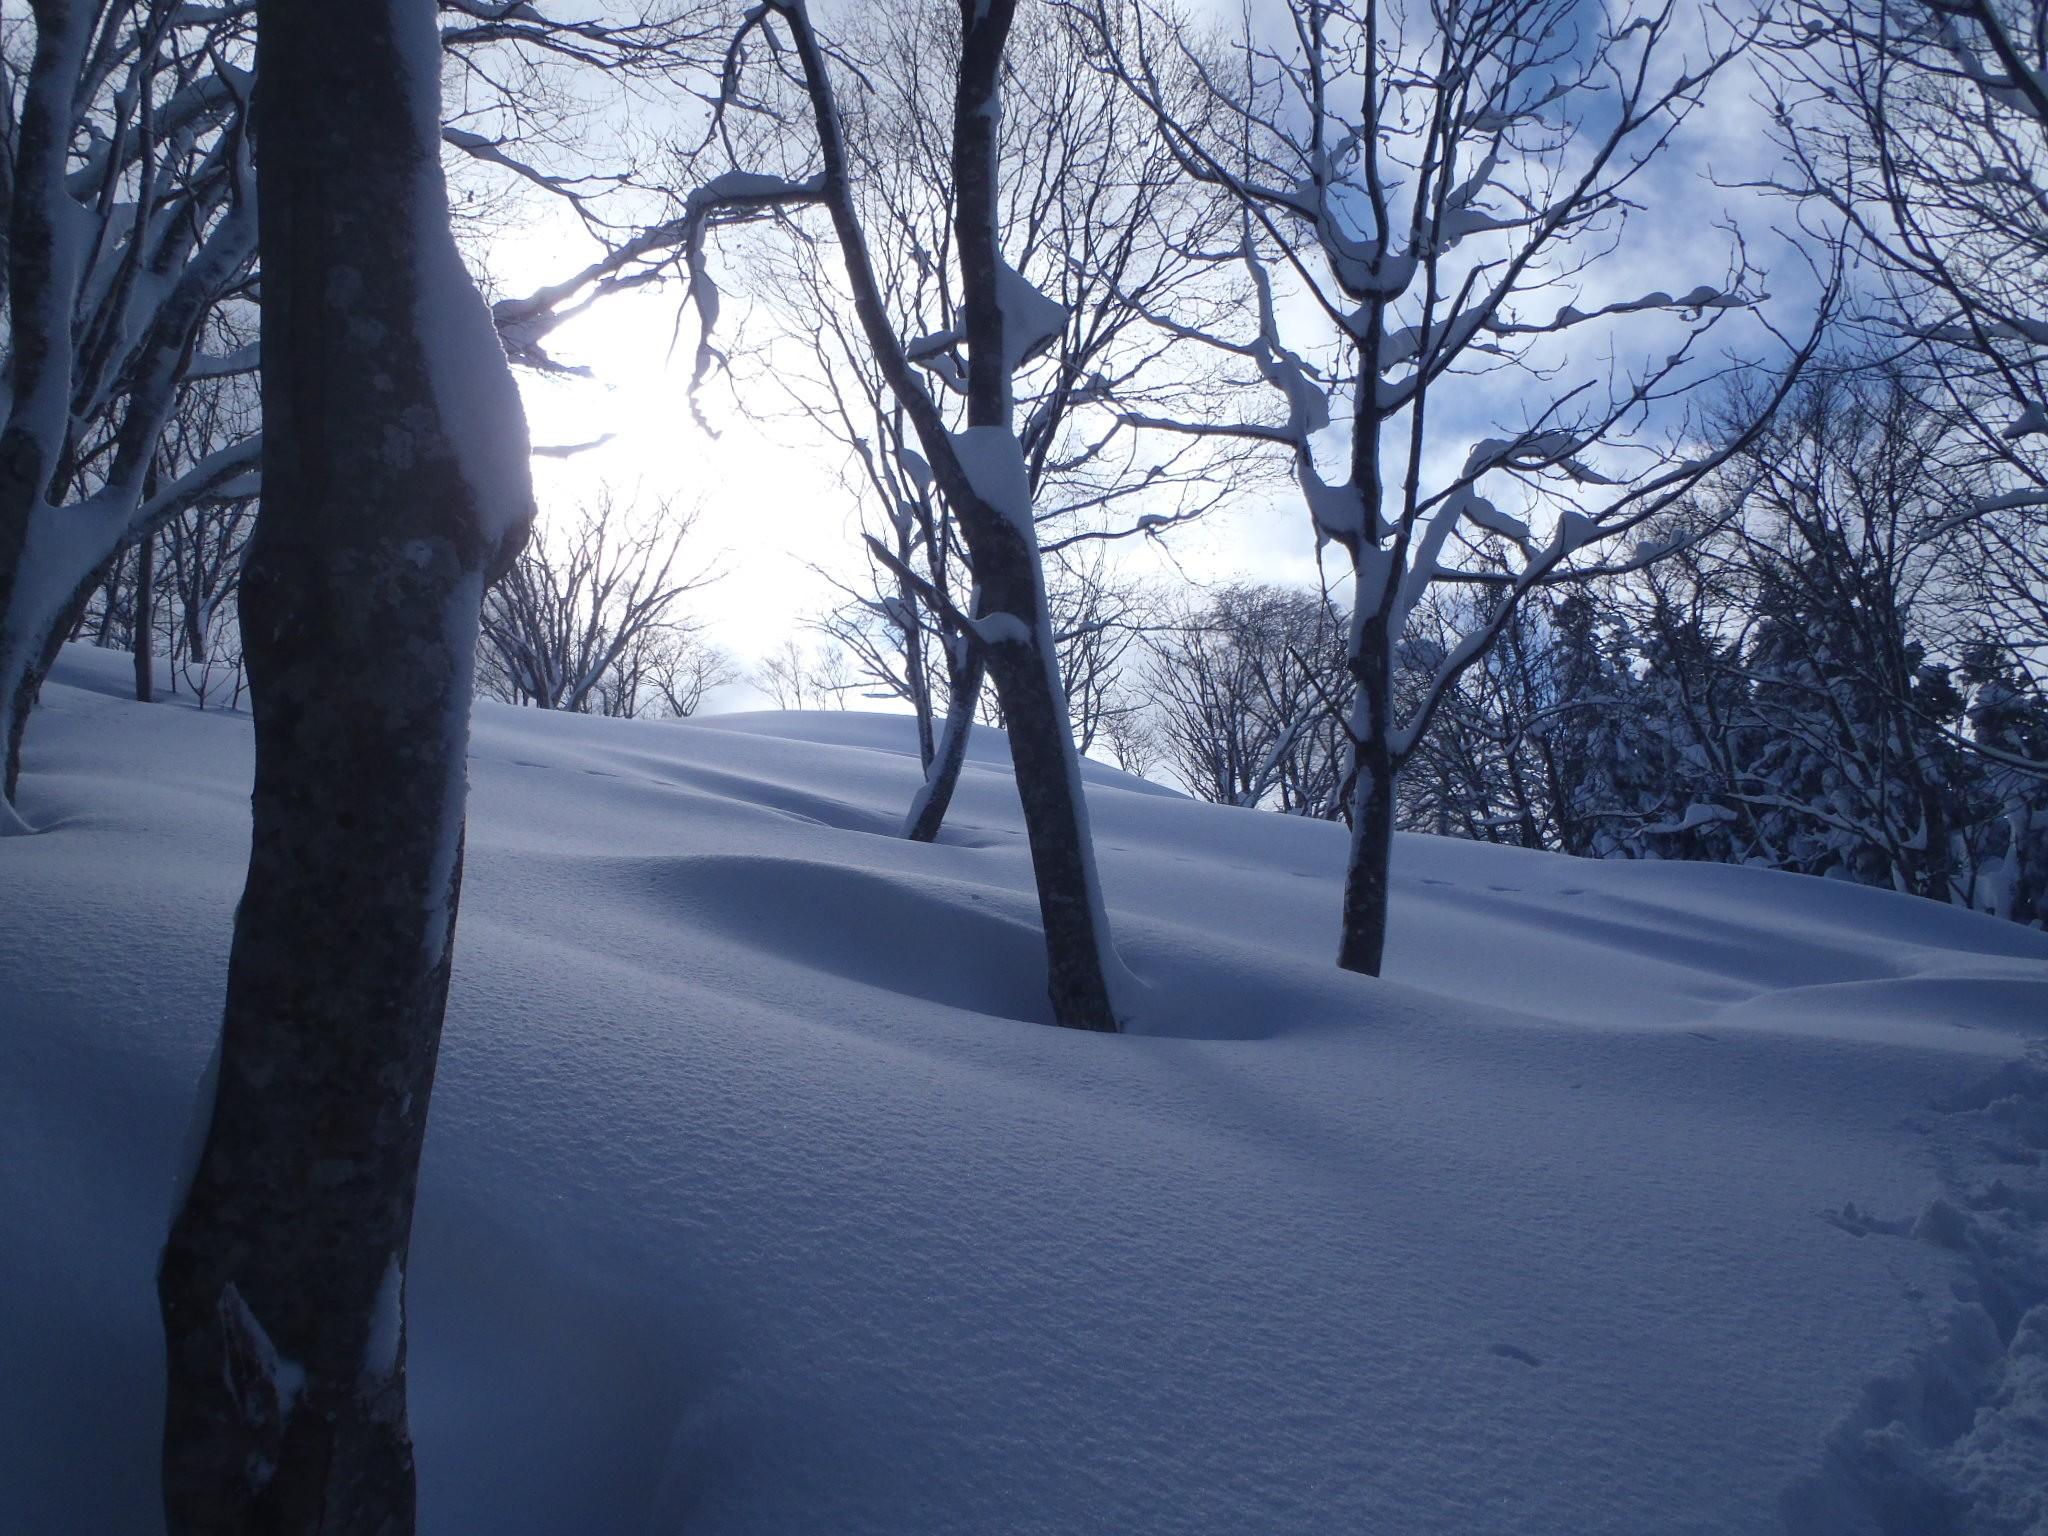 山スキー:御世仏山 (Ski tour Miyobutsu-san)